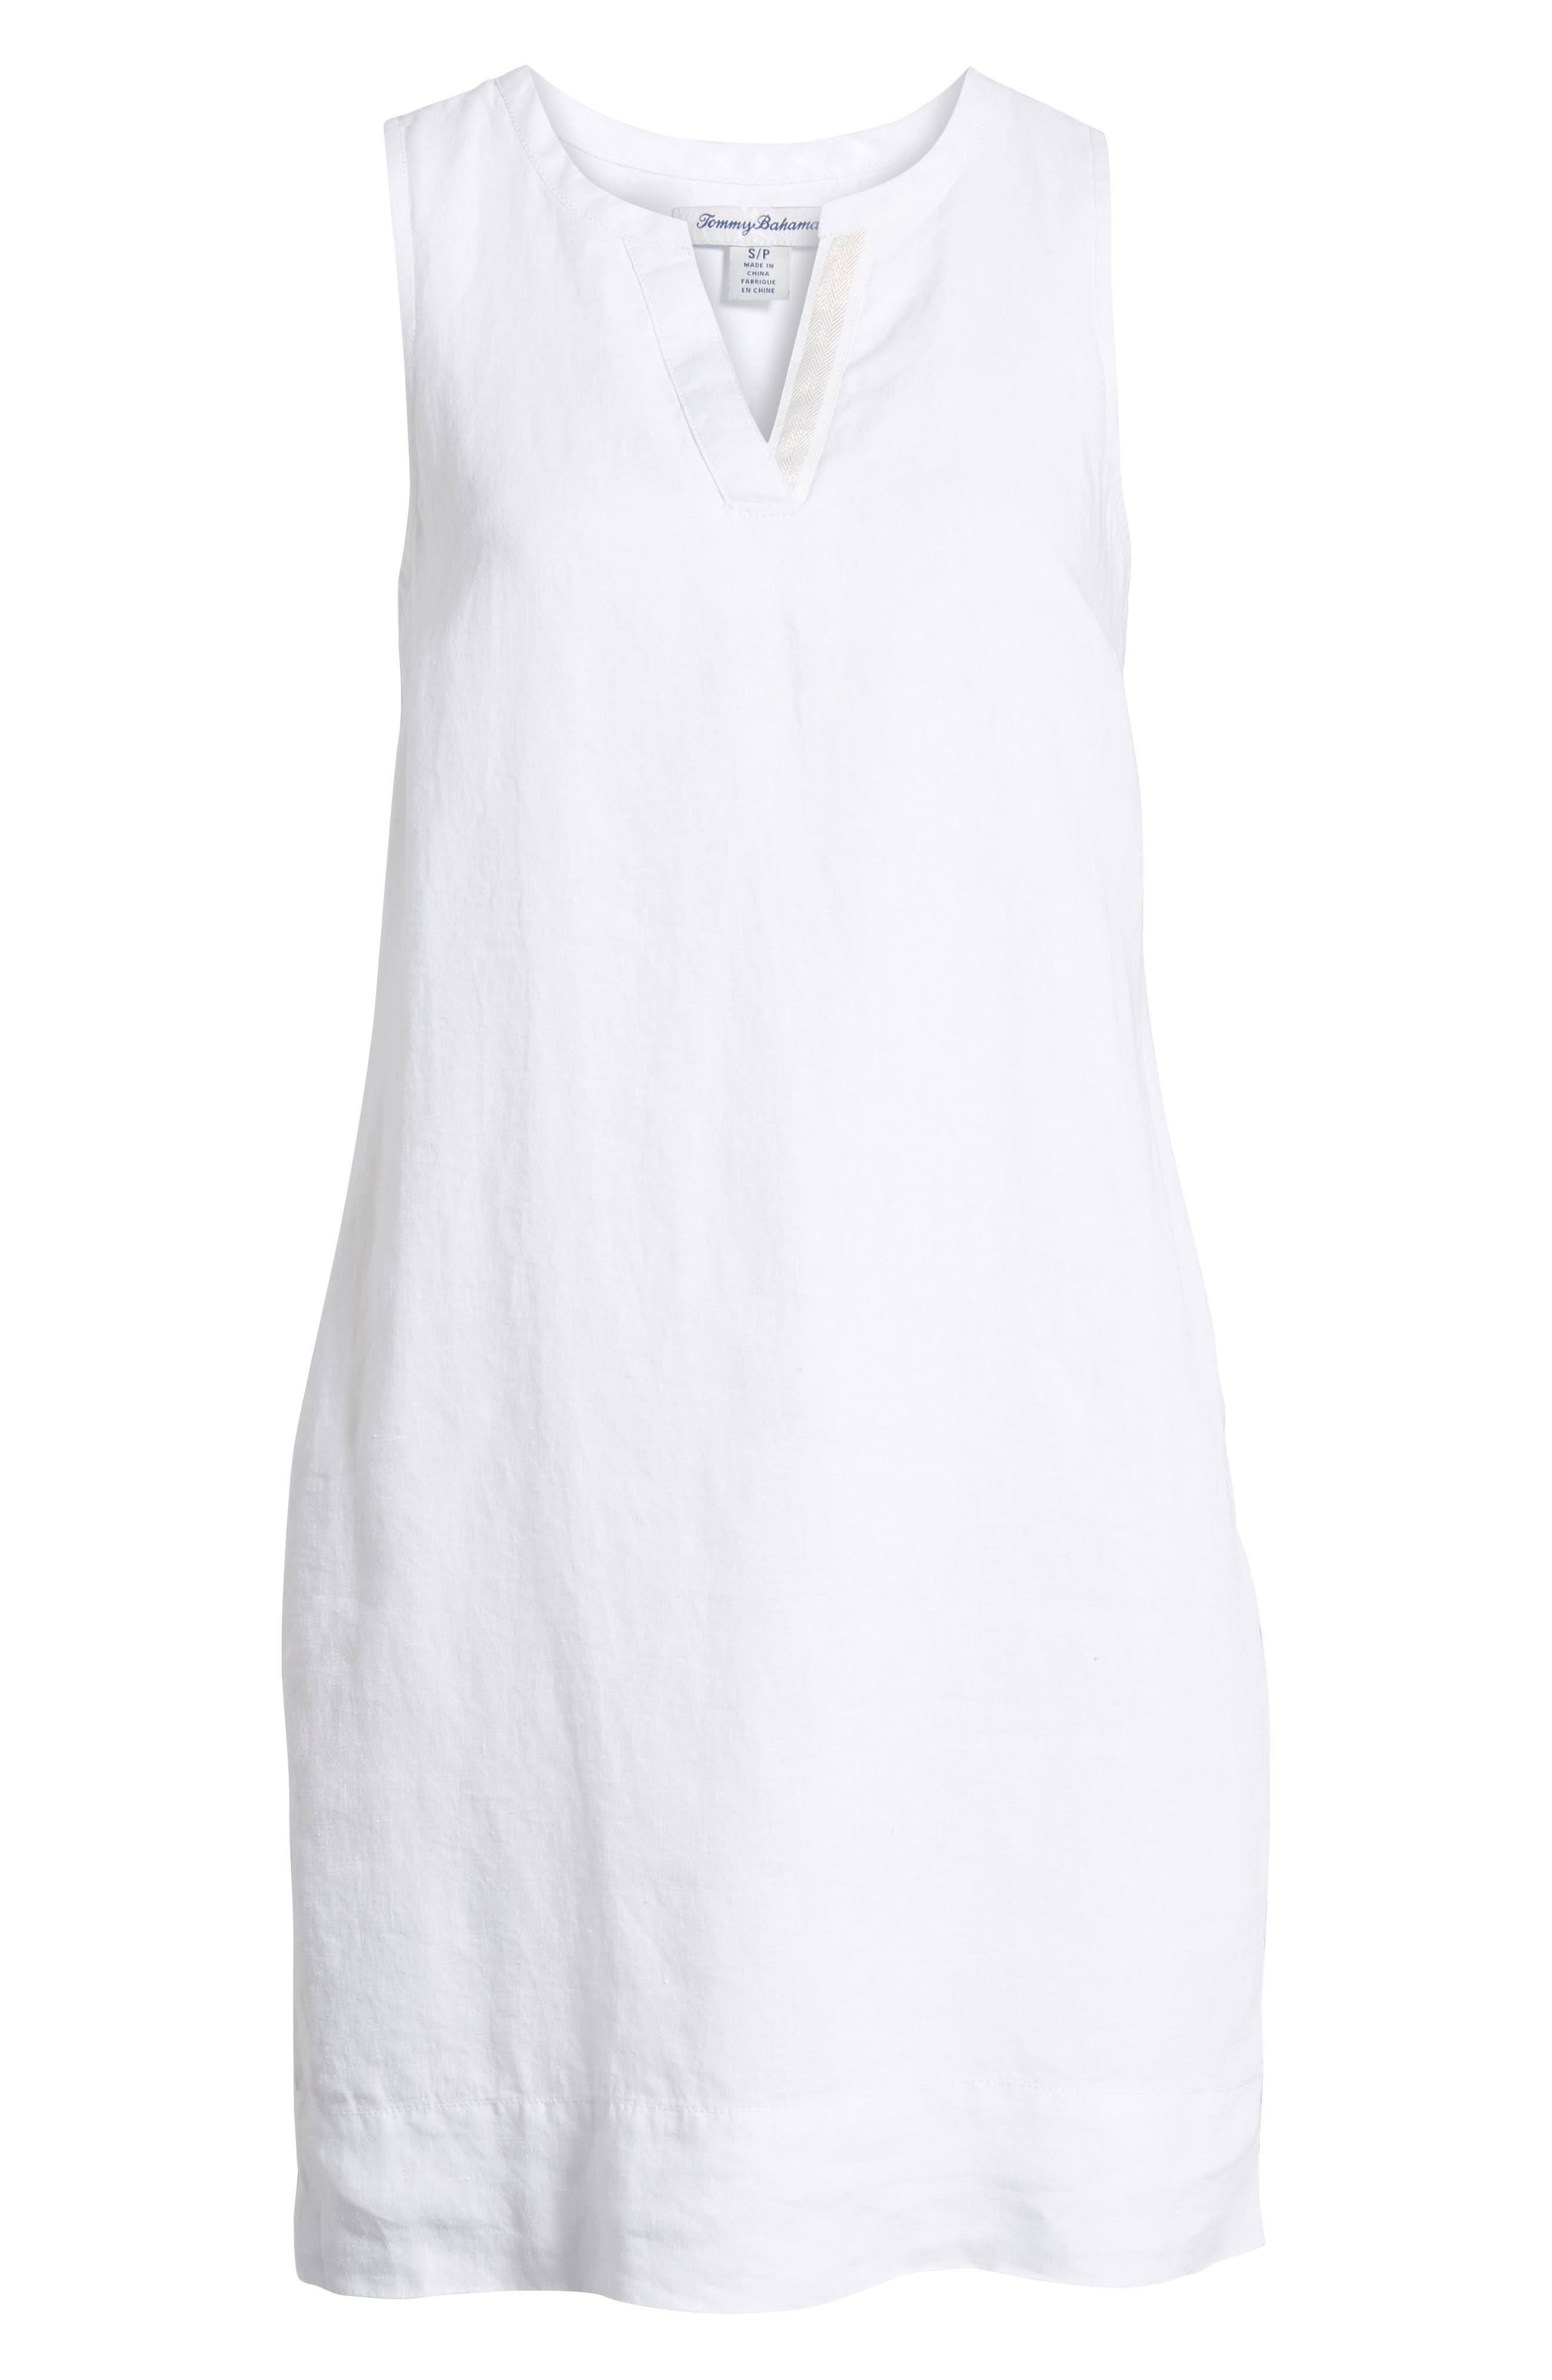 TOMMY BAHAMA, Sea Glass Linen Shift Dress, Alternate thumbnail 7, color, WHITE